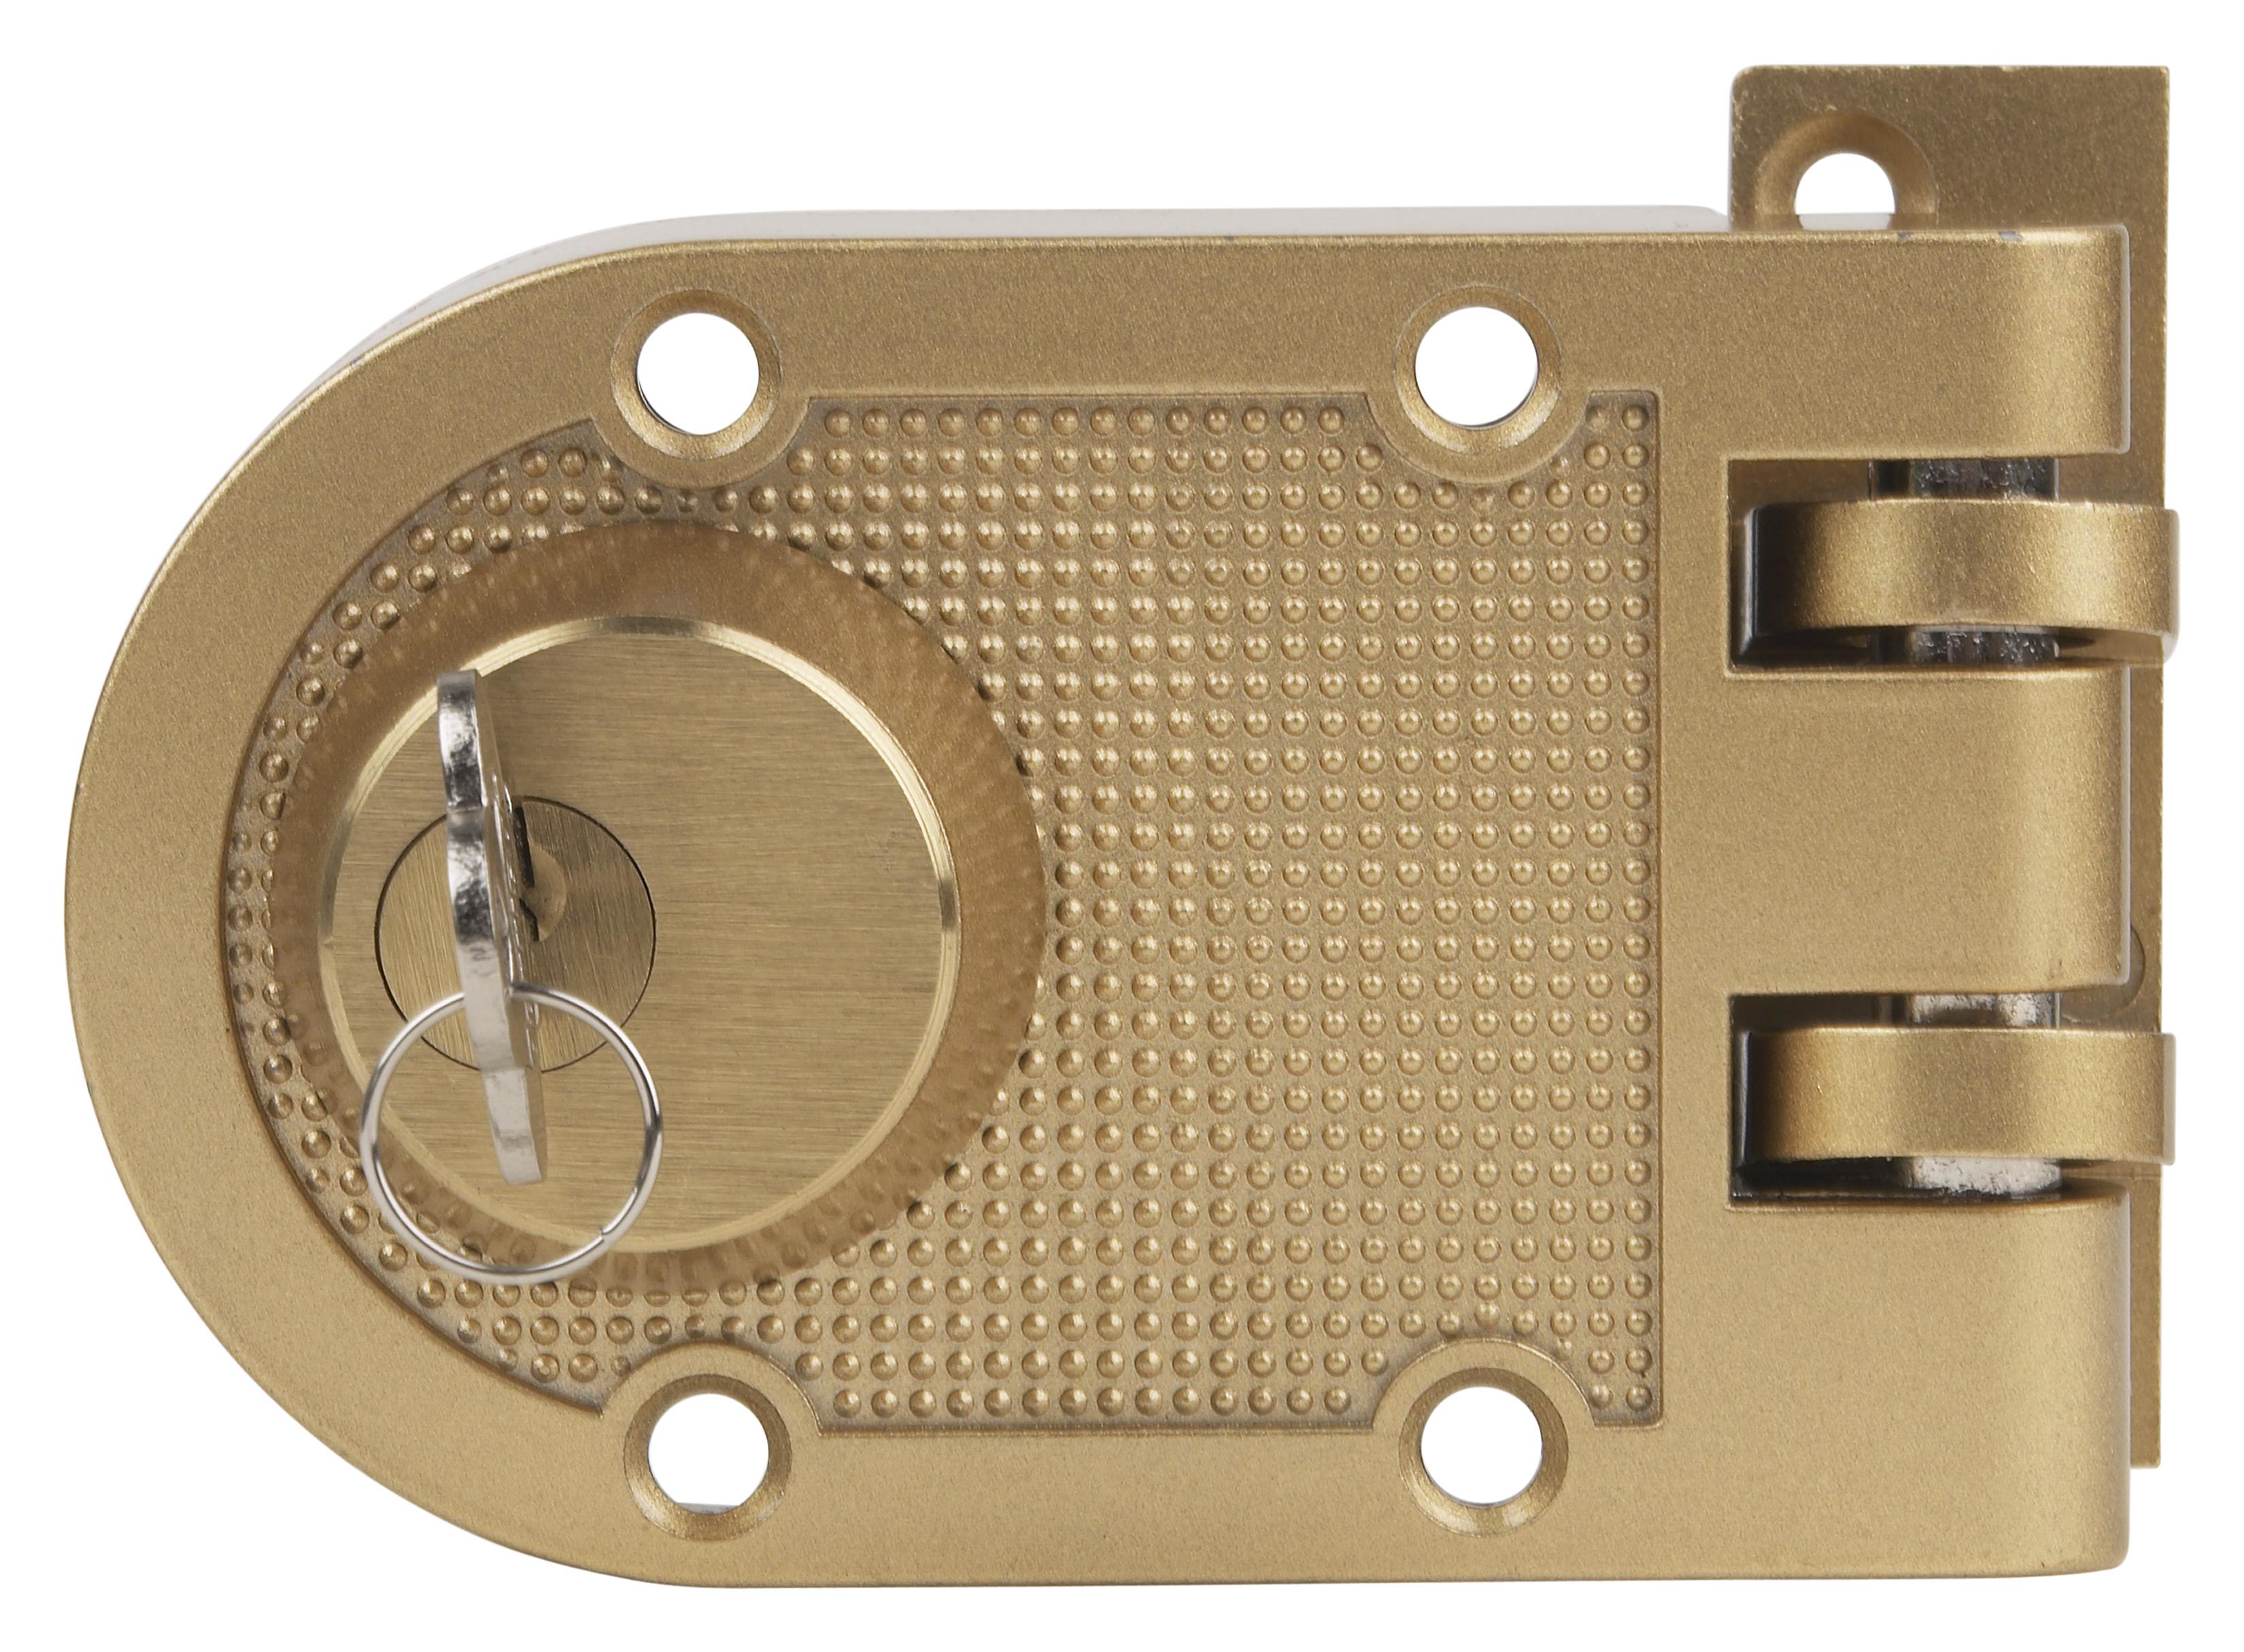 how to install a maxtech surface mount deadbolt lock homesteady. Black Bedroom Furniture Sets. Home Design Ideas